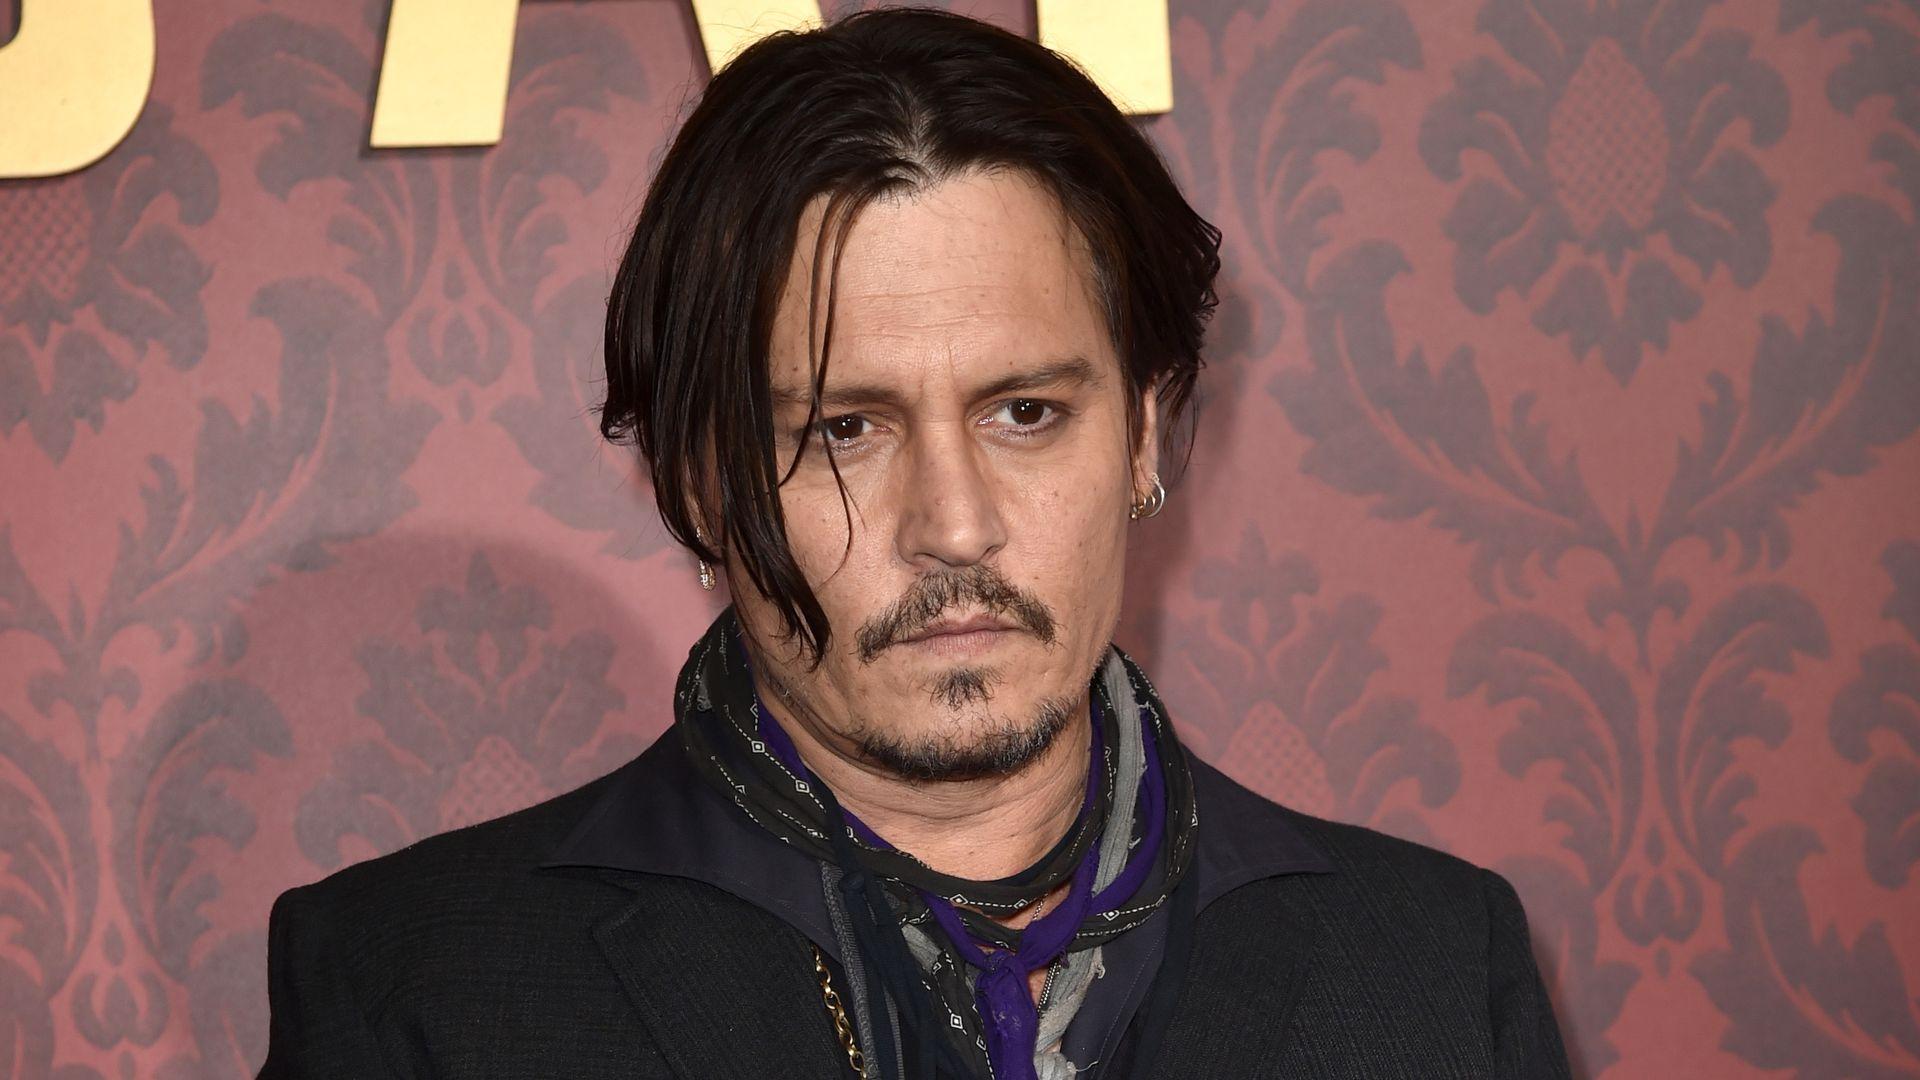 Wegen Trump-Morddrohung: Wird Johnny Depp jetzt entlassen ... Johnny Depp/newspaper Articles